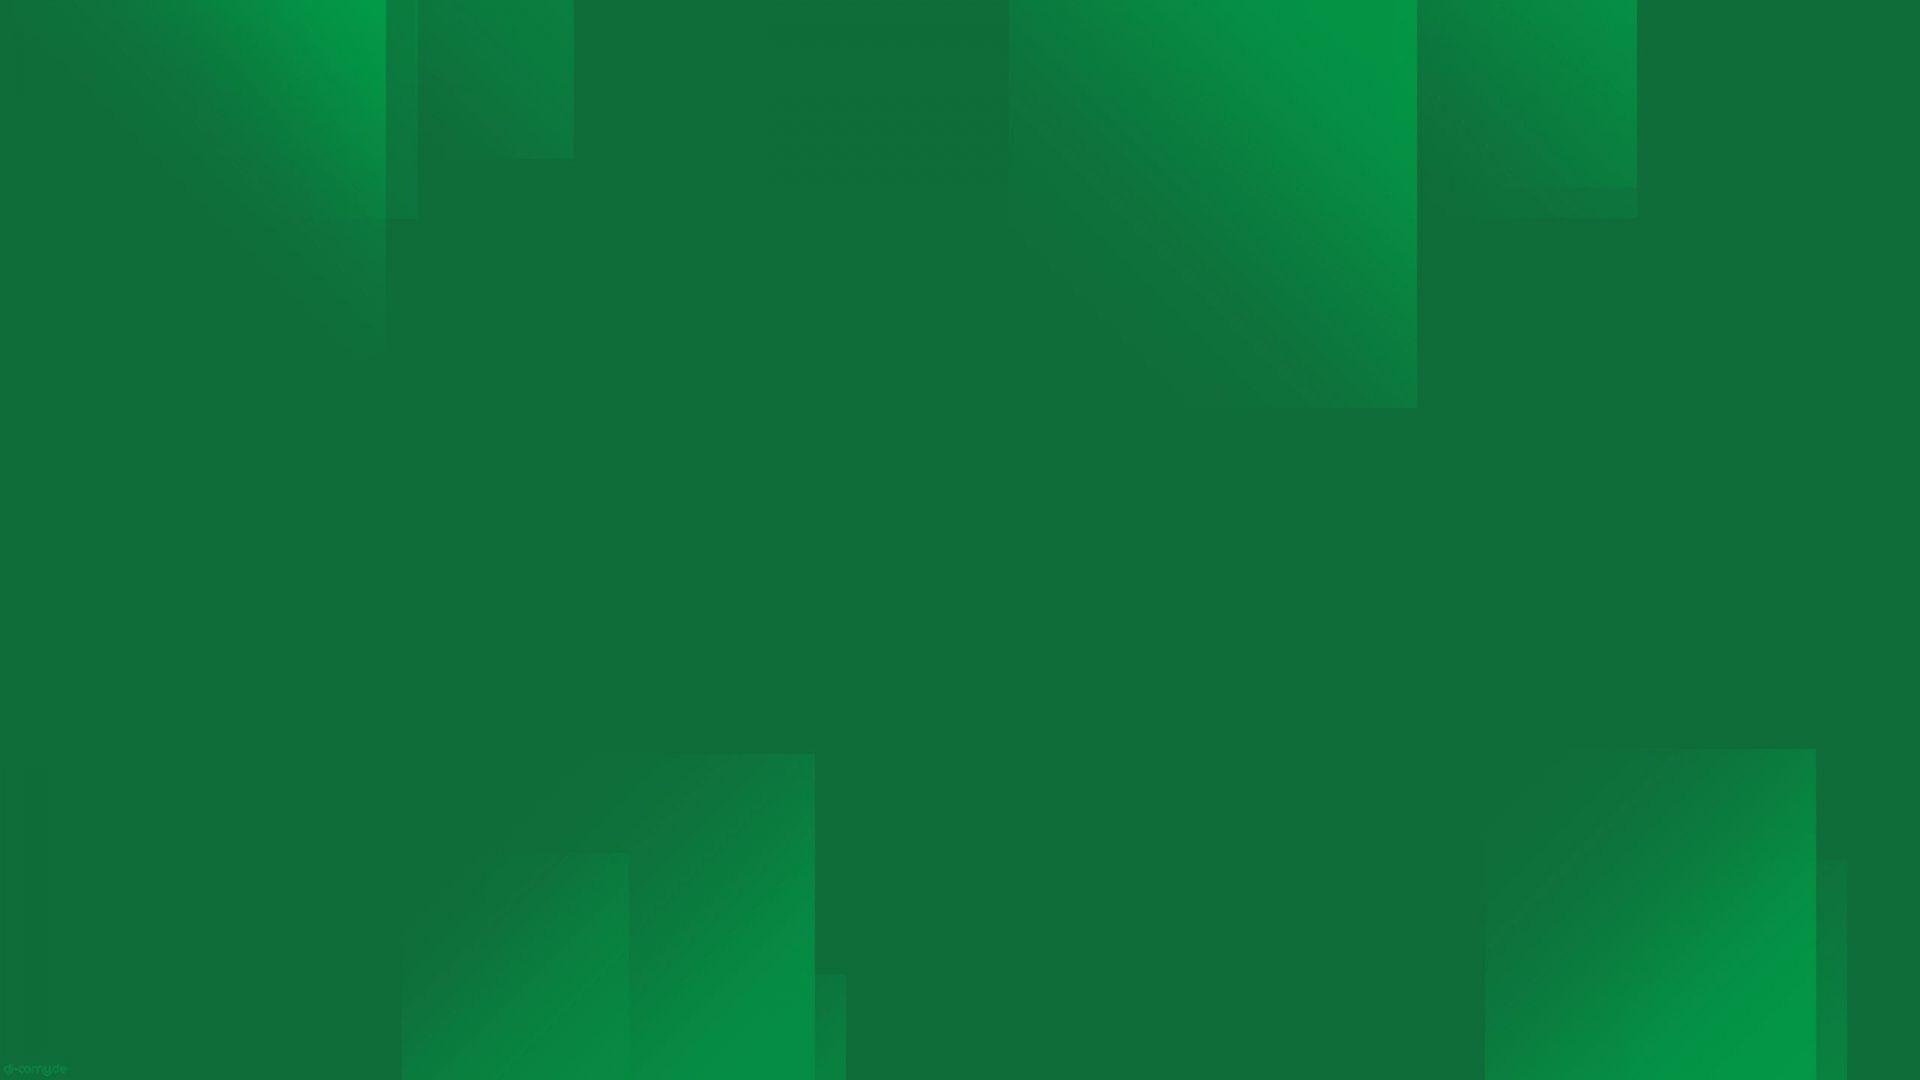 Dark Green Wallpaper 60 195618 Images HD Wallpapers